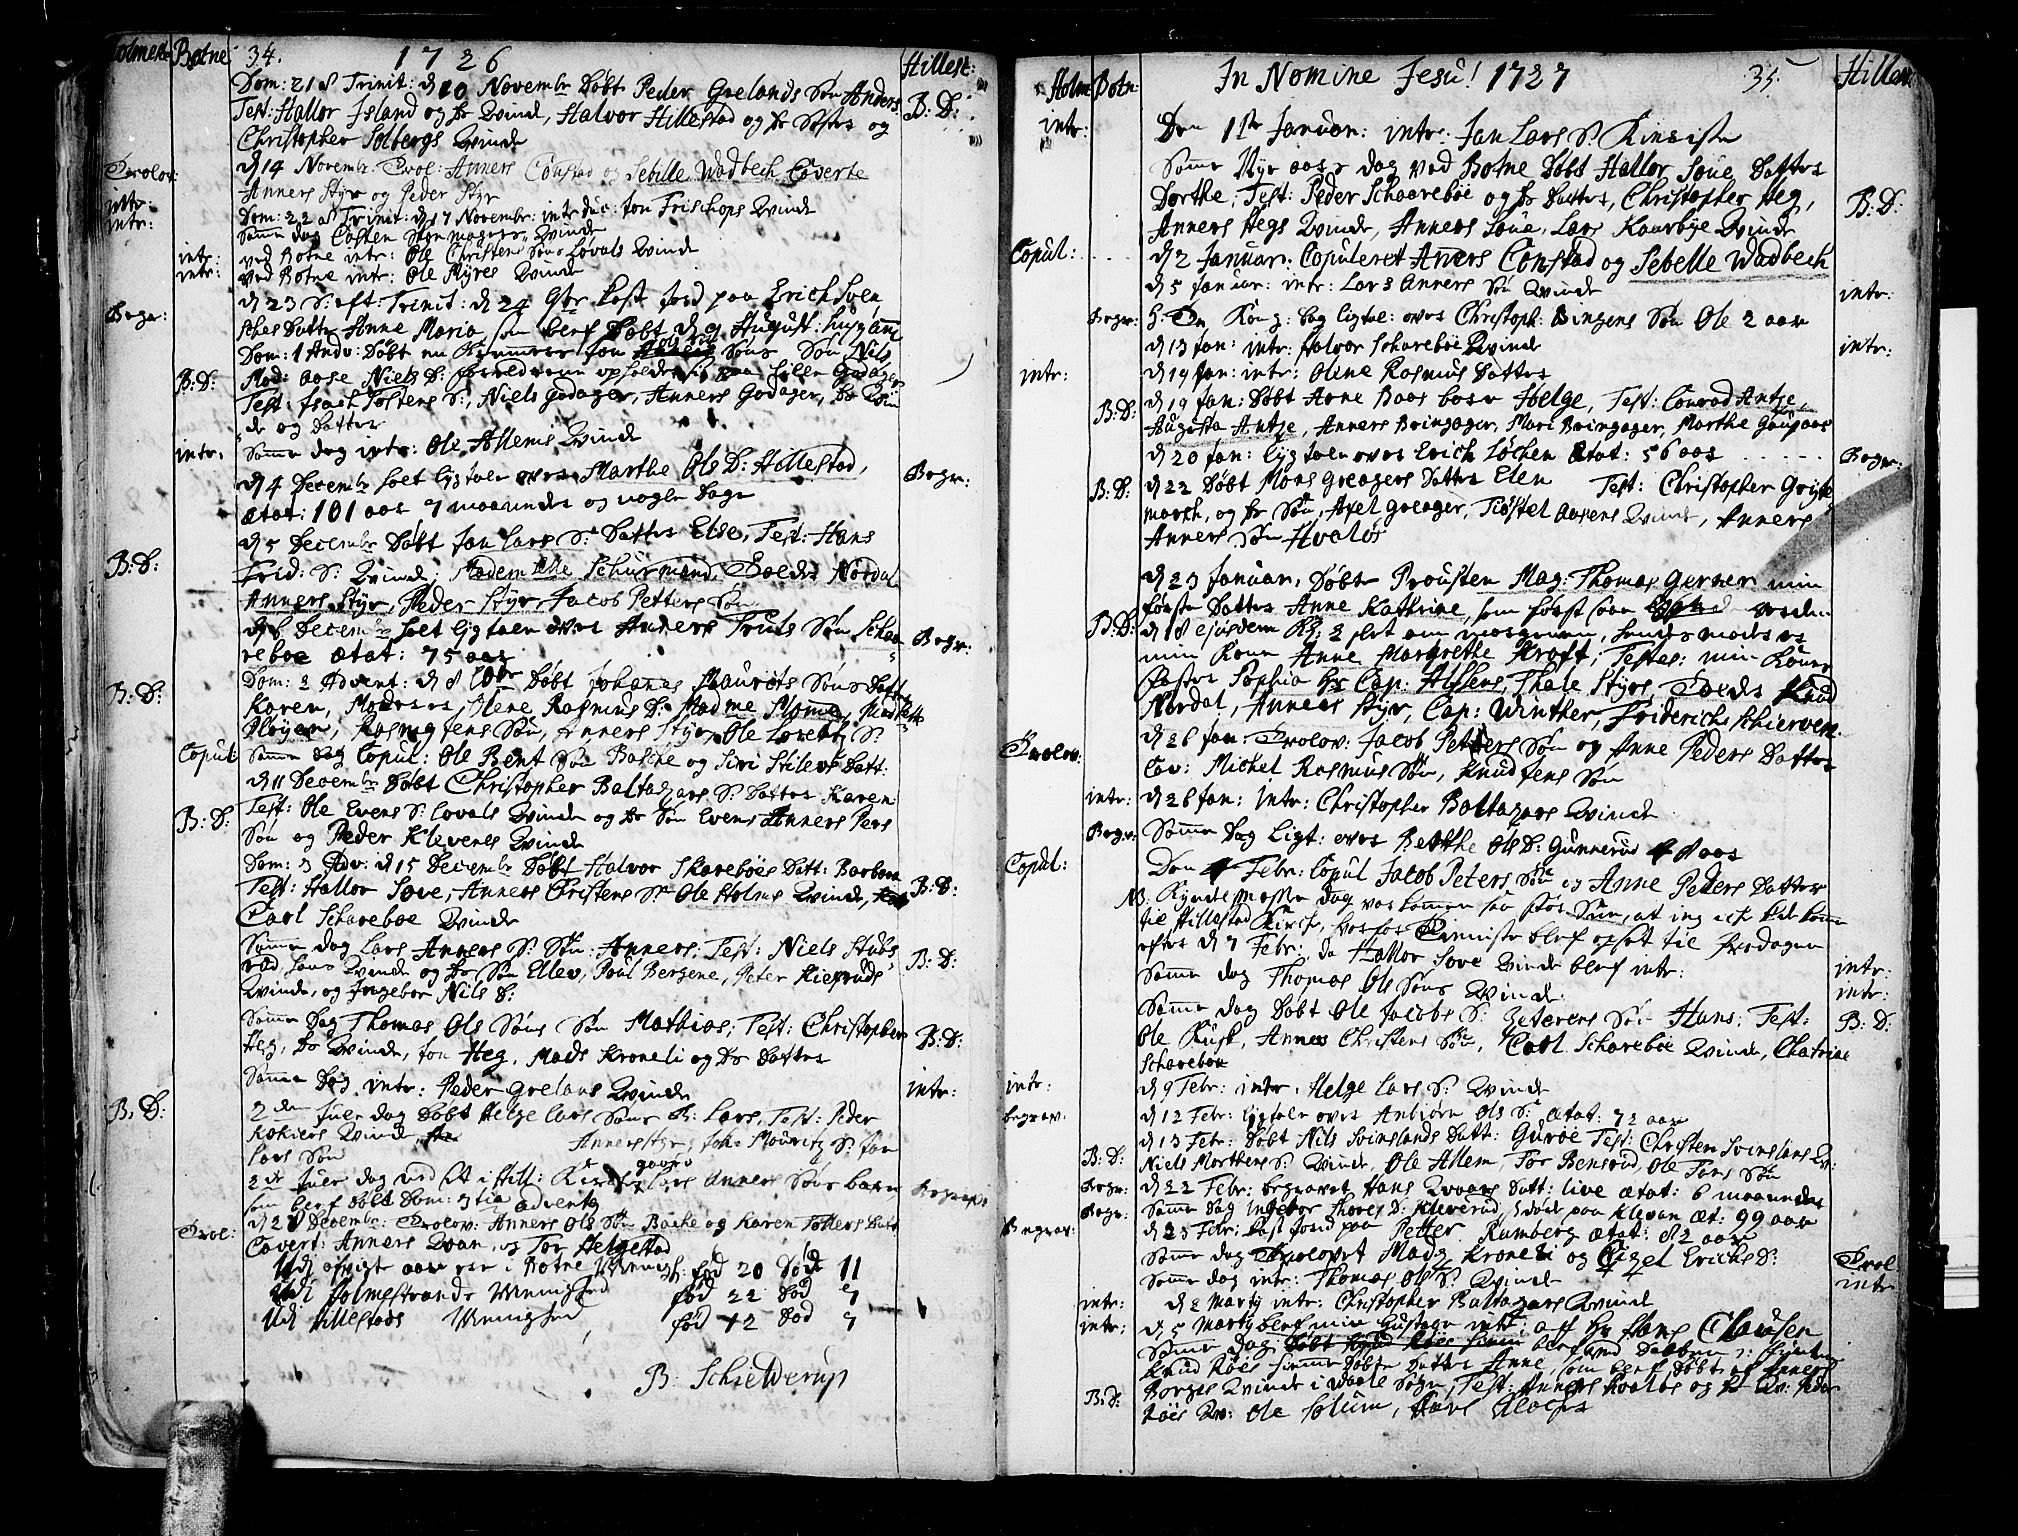 SAKO, Botne kirkebøker, F/Fa/L0001a: Ministerialbok nr. I 1A, 1707-1778, s. 34-35